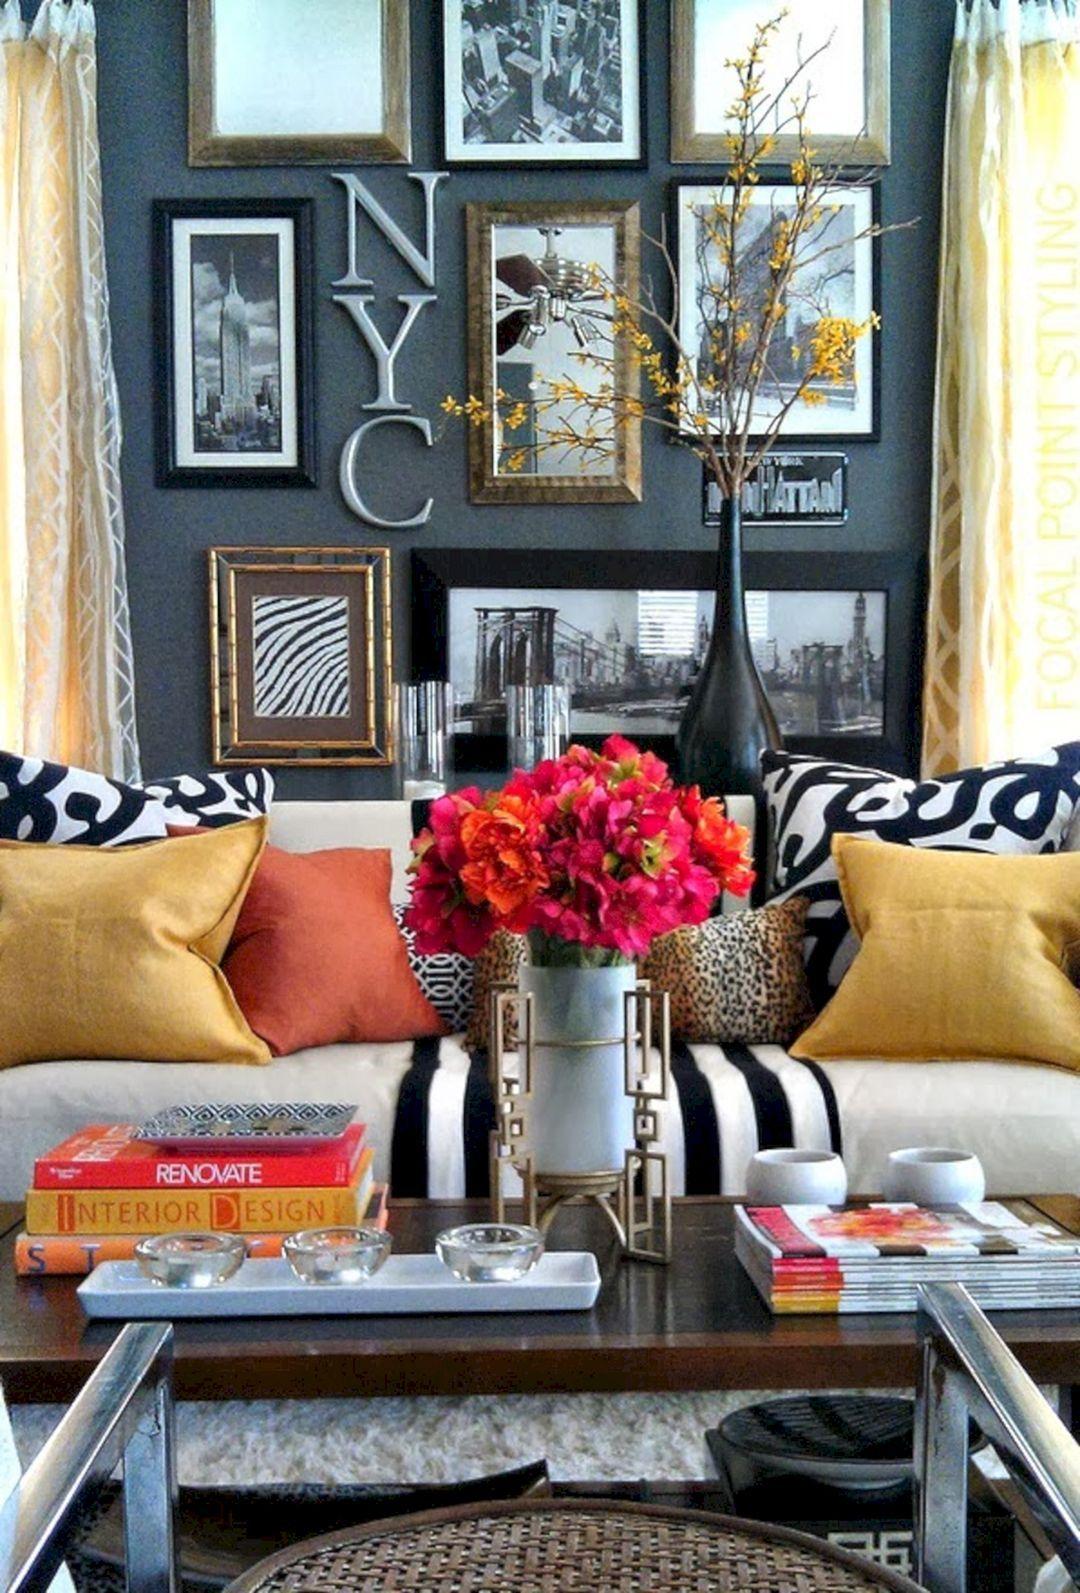 60 most popular focal points ideas to build a beautiful interior rh ar pinterest com